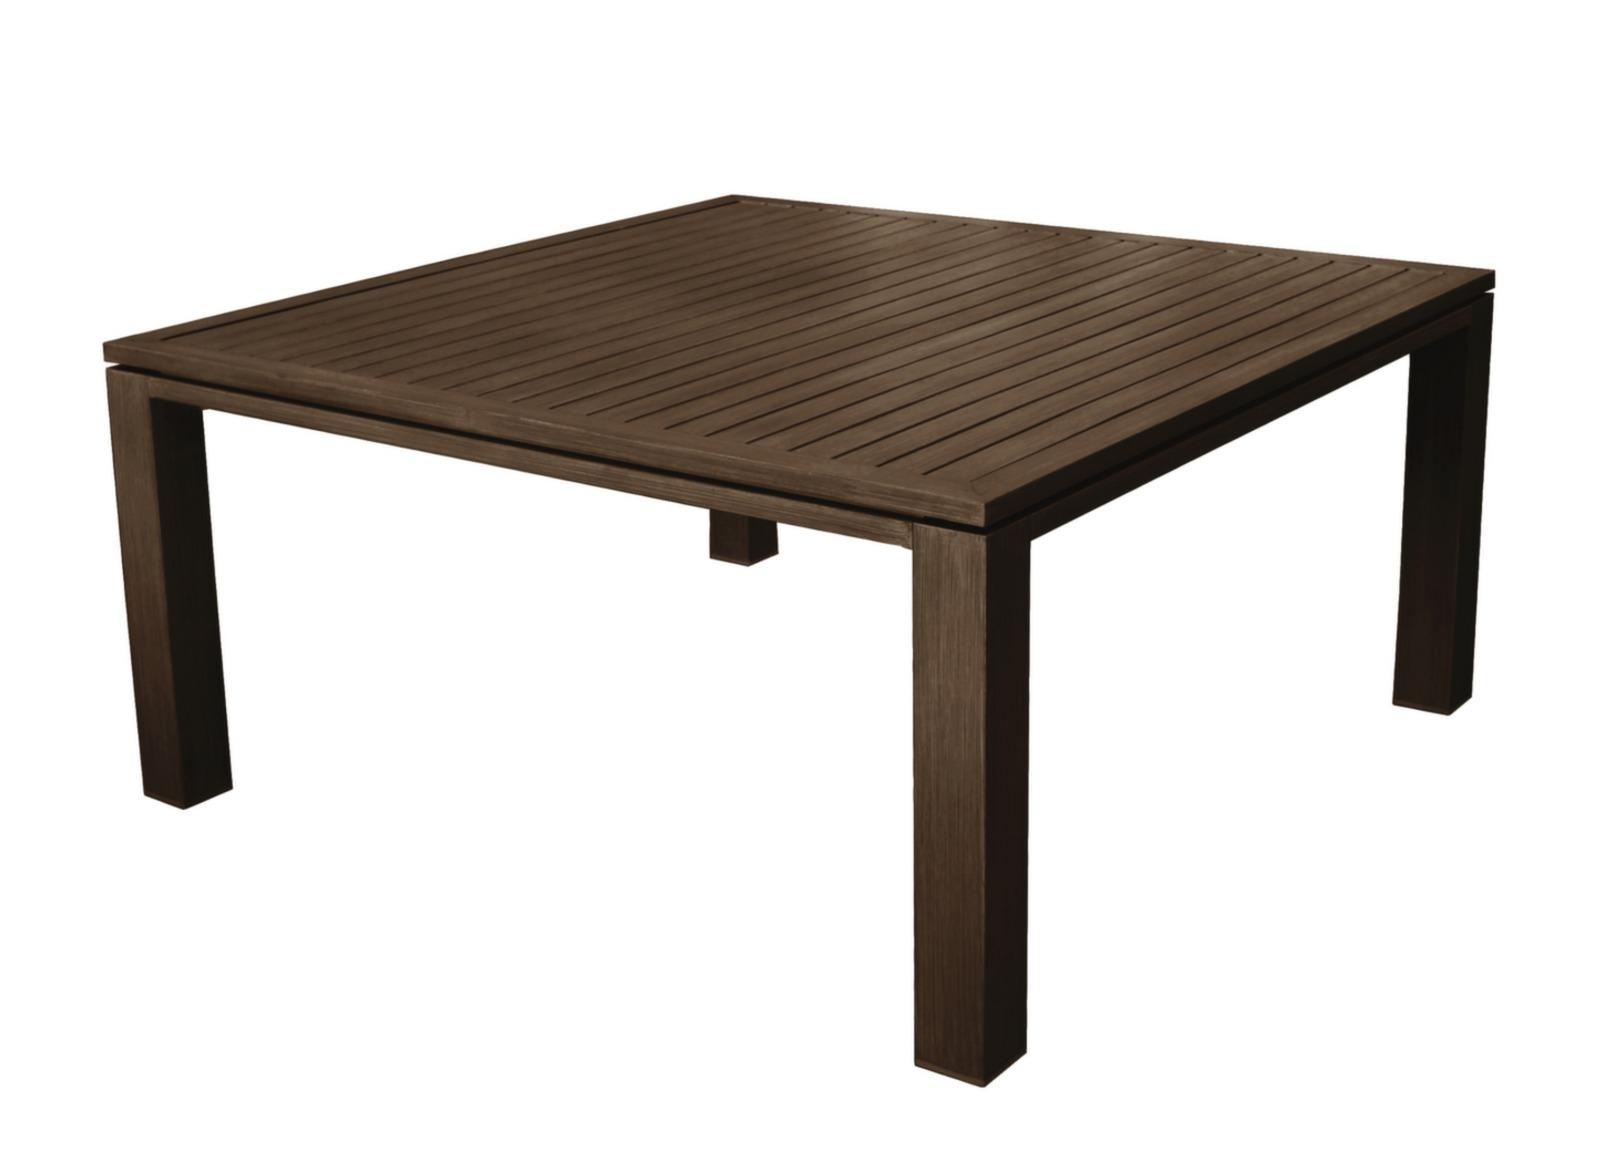 Salon Jardin Teck Table Carree | Table Basse De Salon En Bois De ...